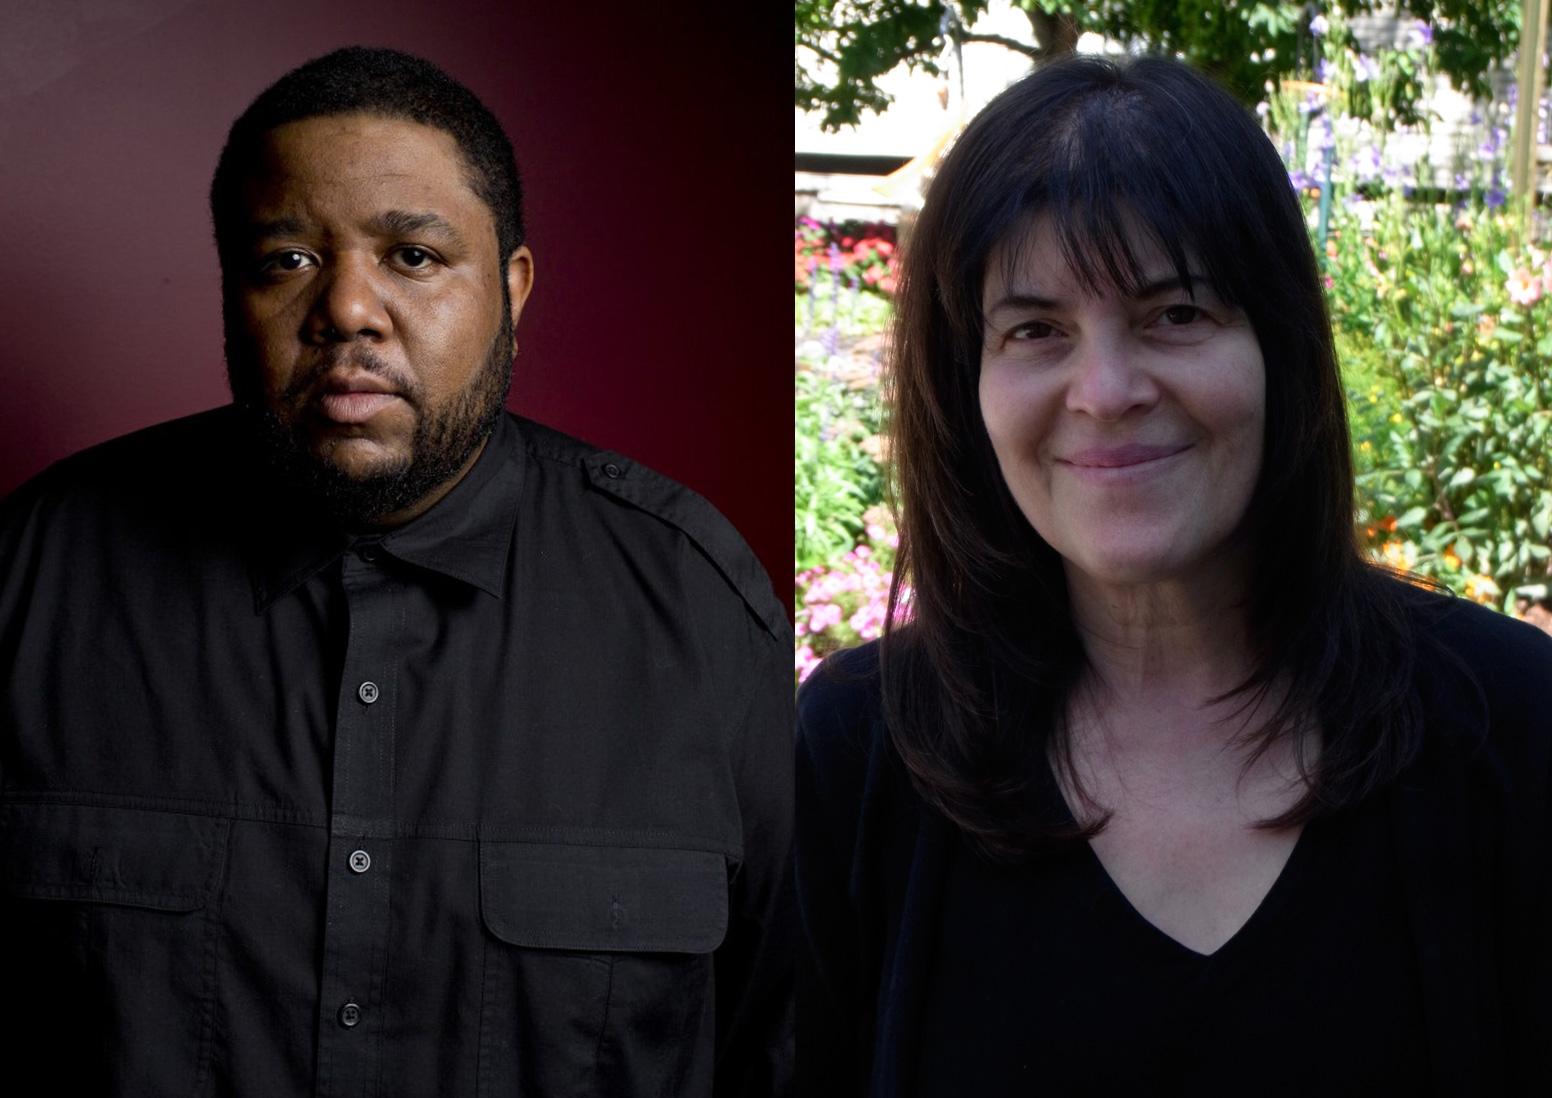 Tyshawn Sorey and Marilyn Crispell